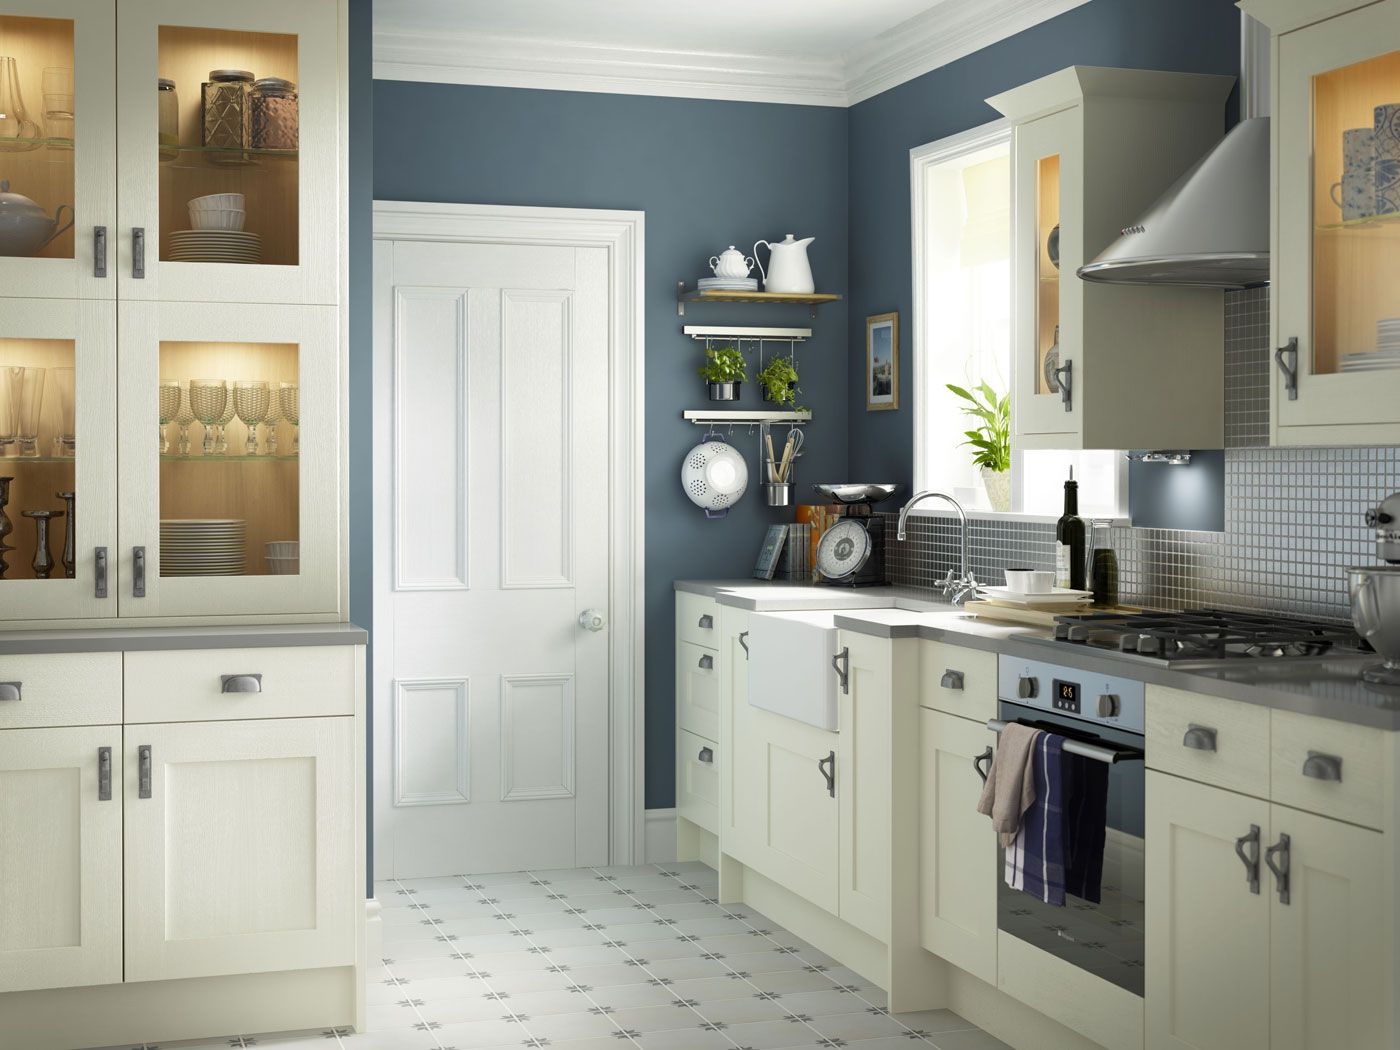 Carisbrooke Ivory Blue kitchen walls, Heritage kitchen